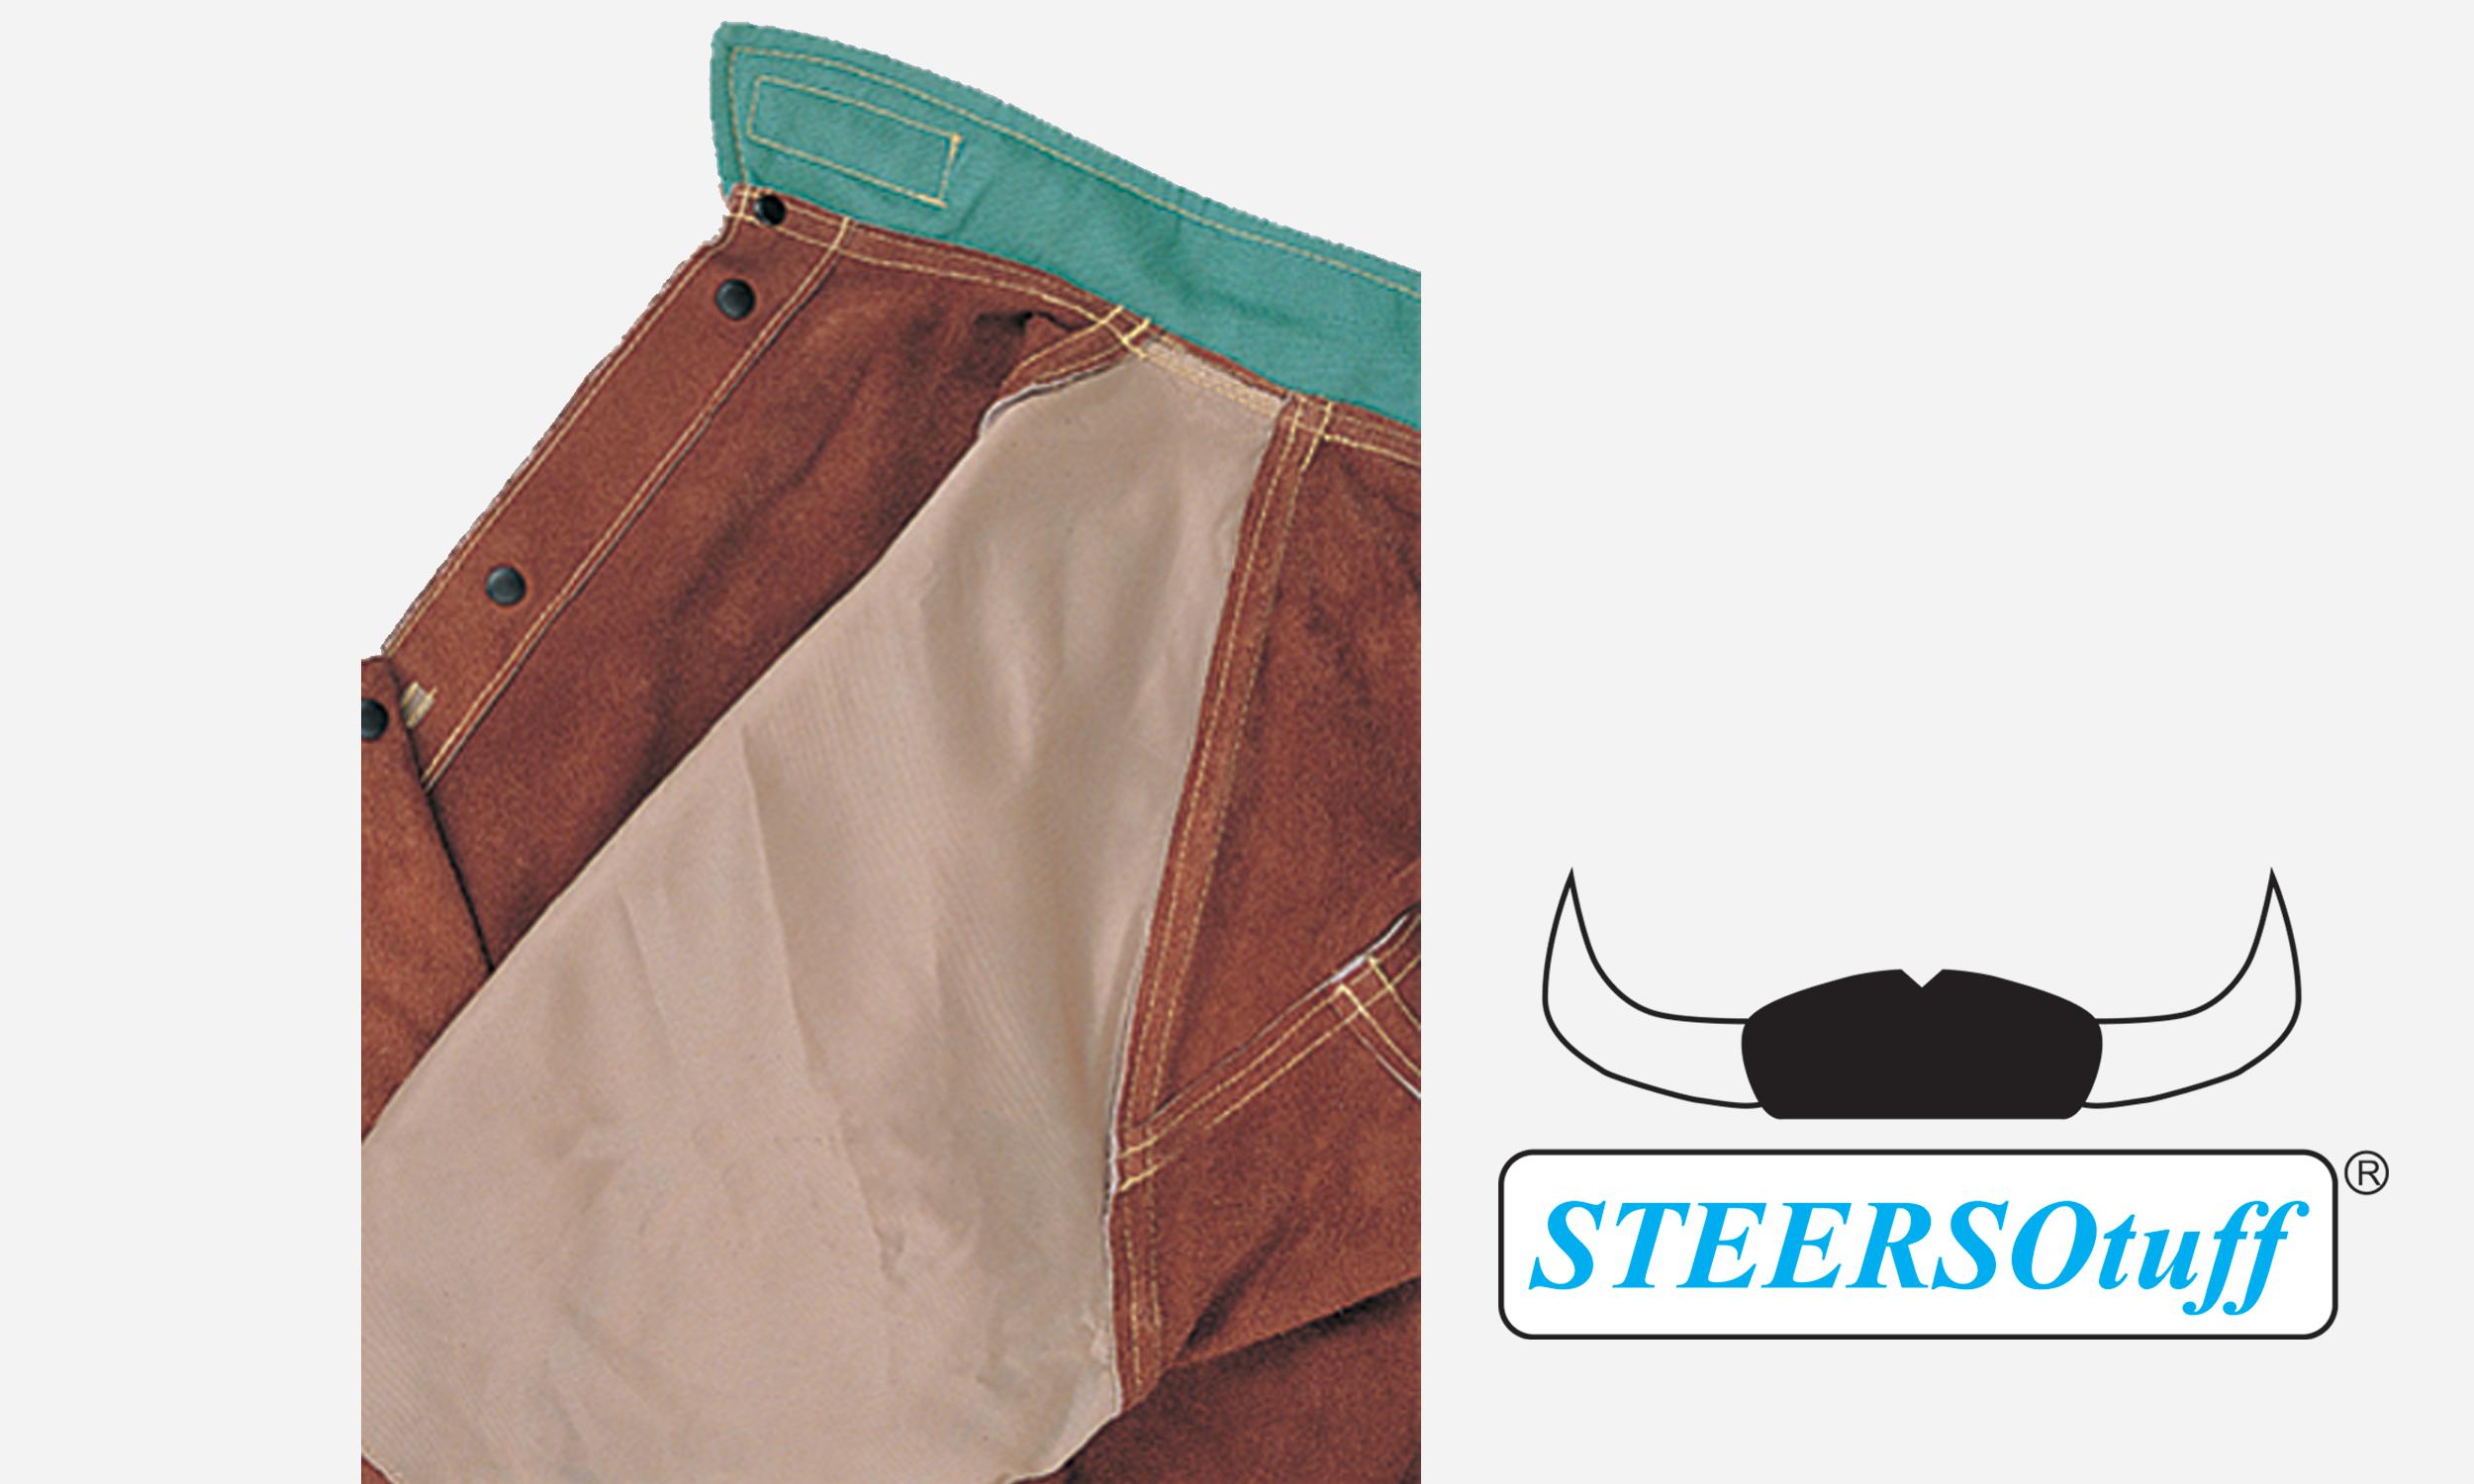 44-7300 STEERSOtuff Leather Jacket Inside View.png